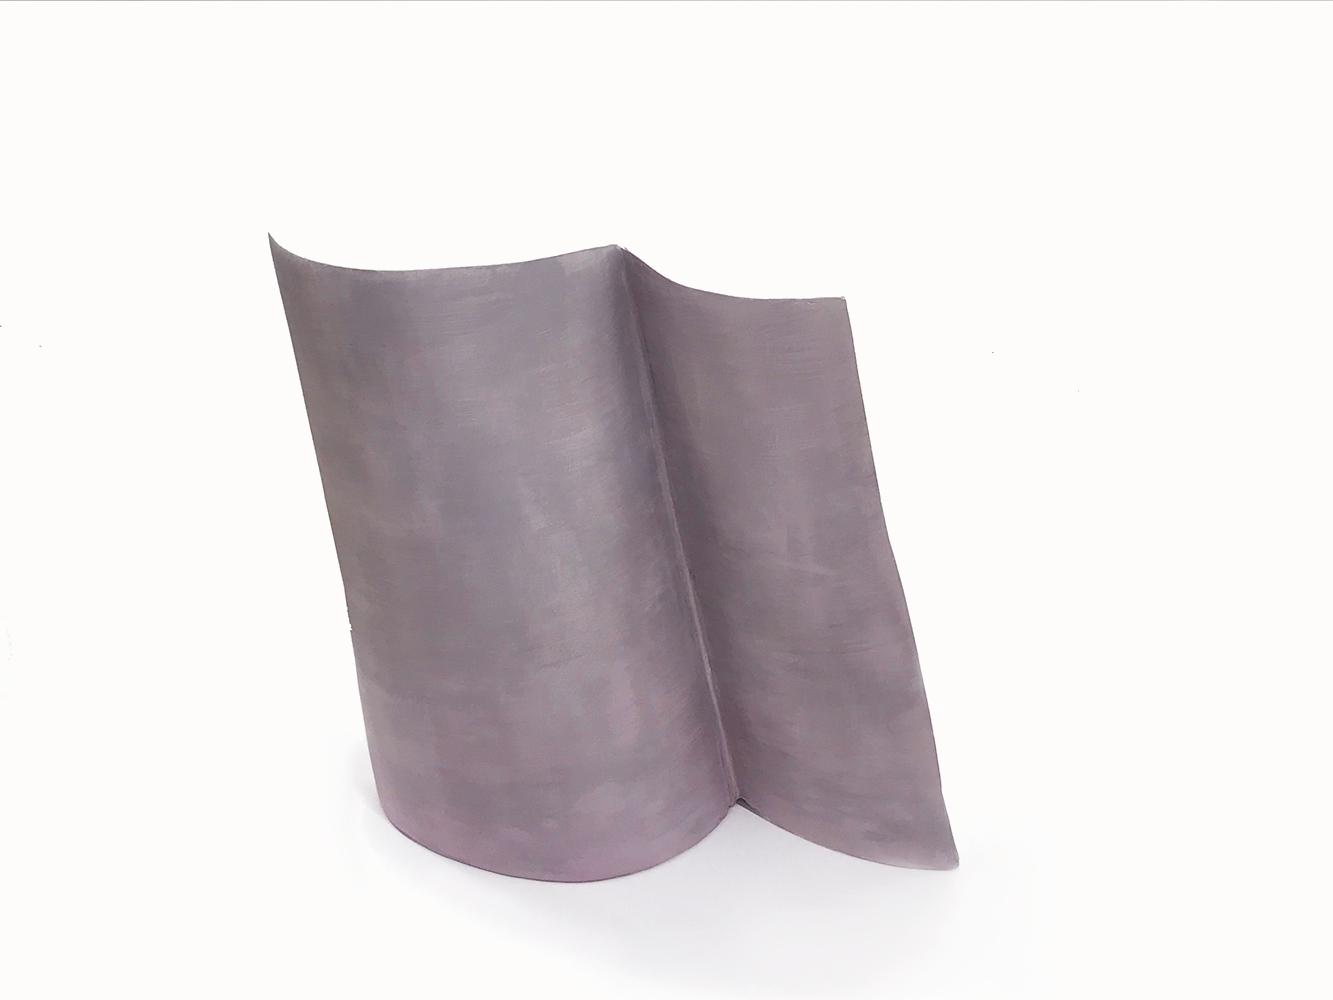 Simone Rochon, Formes fléchies no. 4 , 2017, plaster, fiber glass and acrylic paint, dimensions variable.